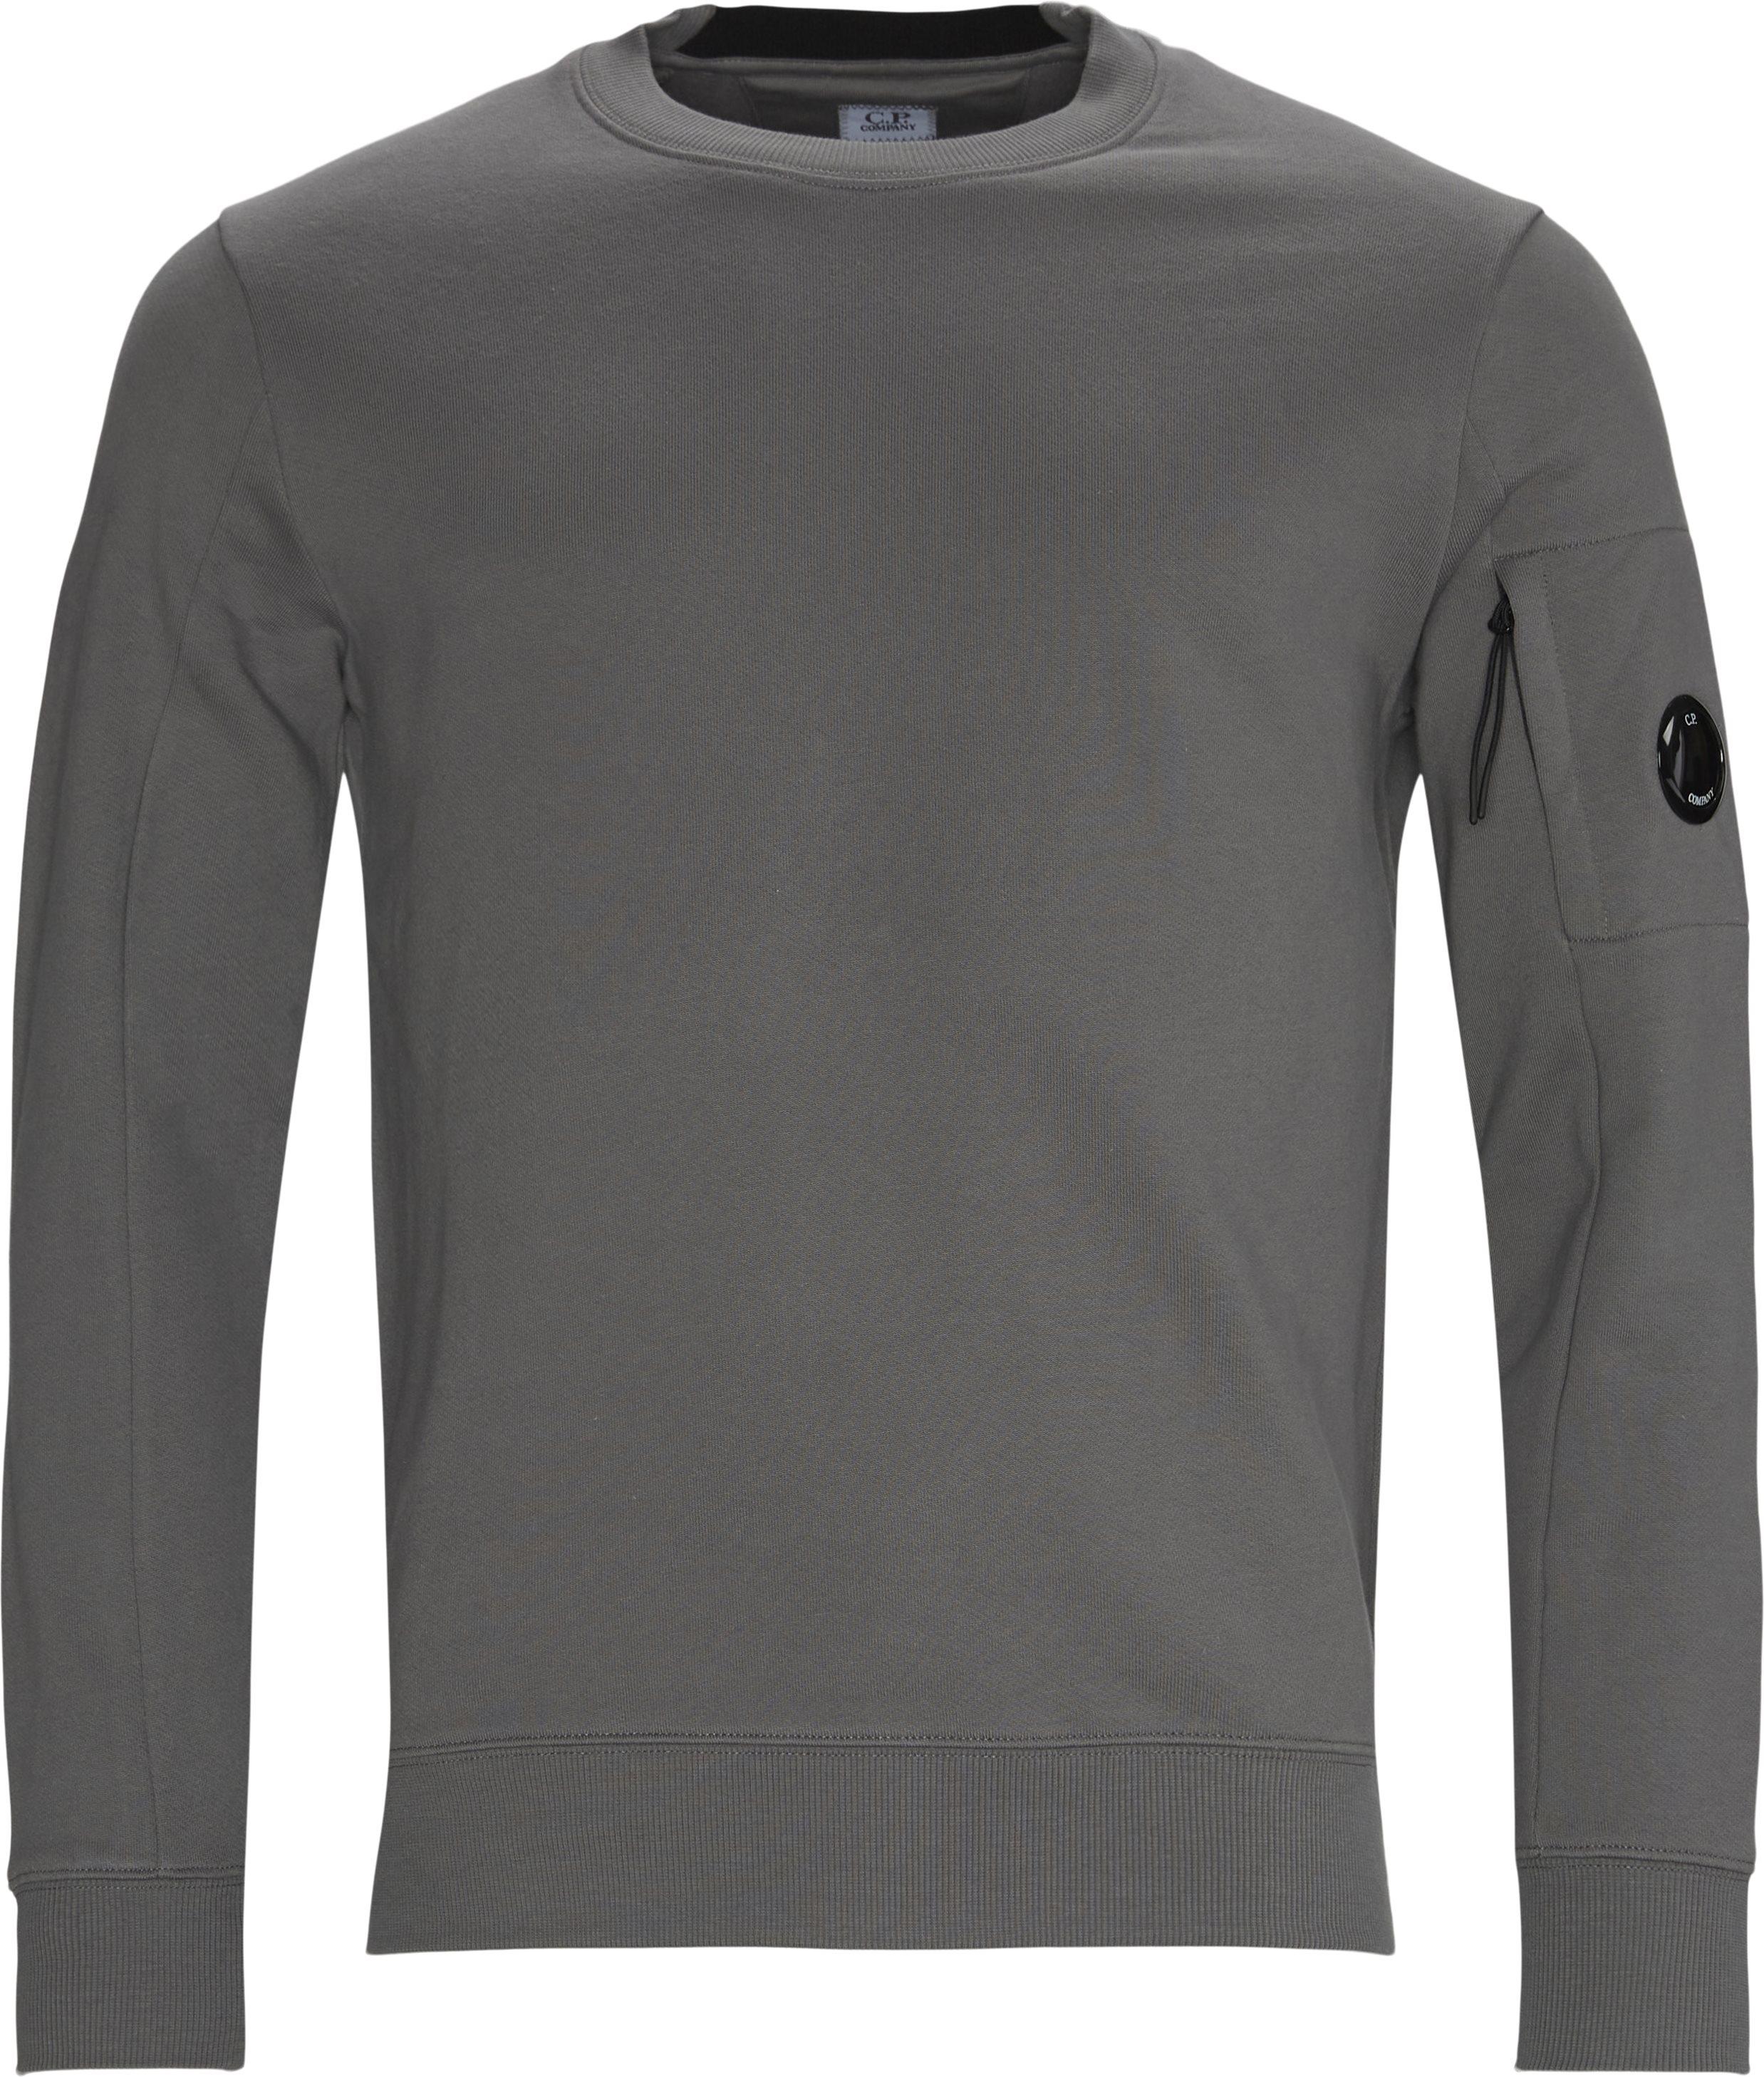 Garment Dyed Light Fleece Lens Crew Sweat - Sweatshirts - Regular fit - Grey